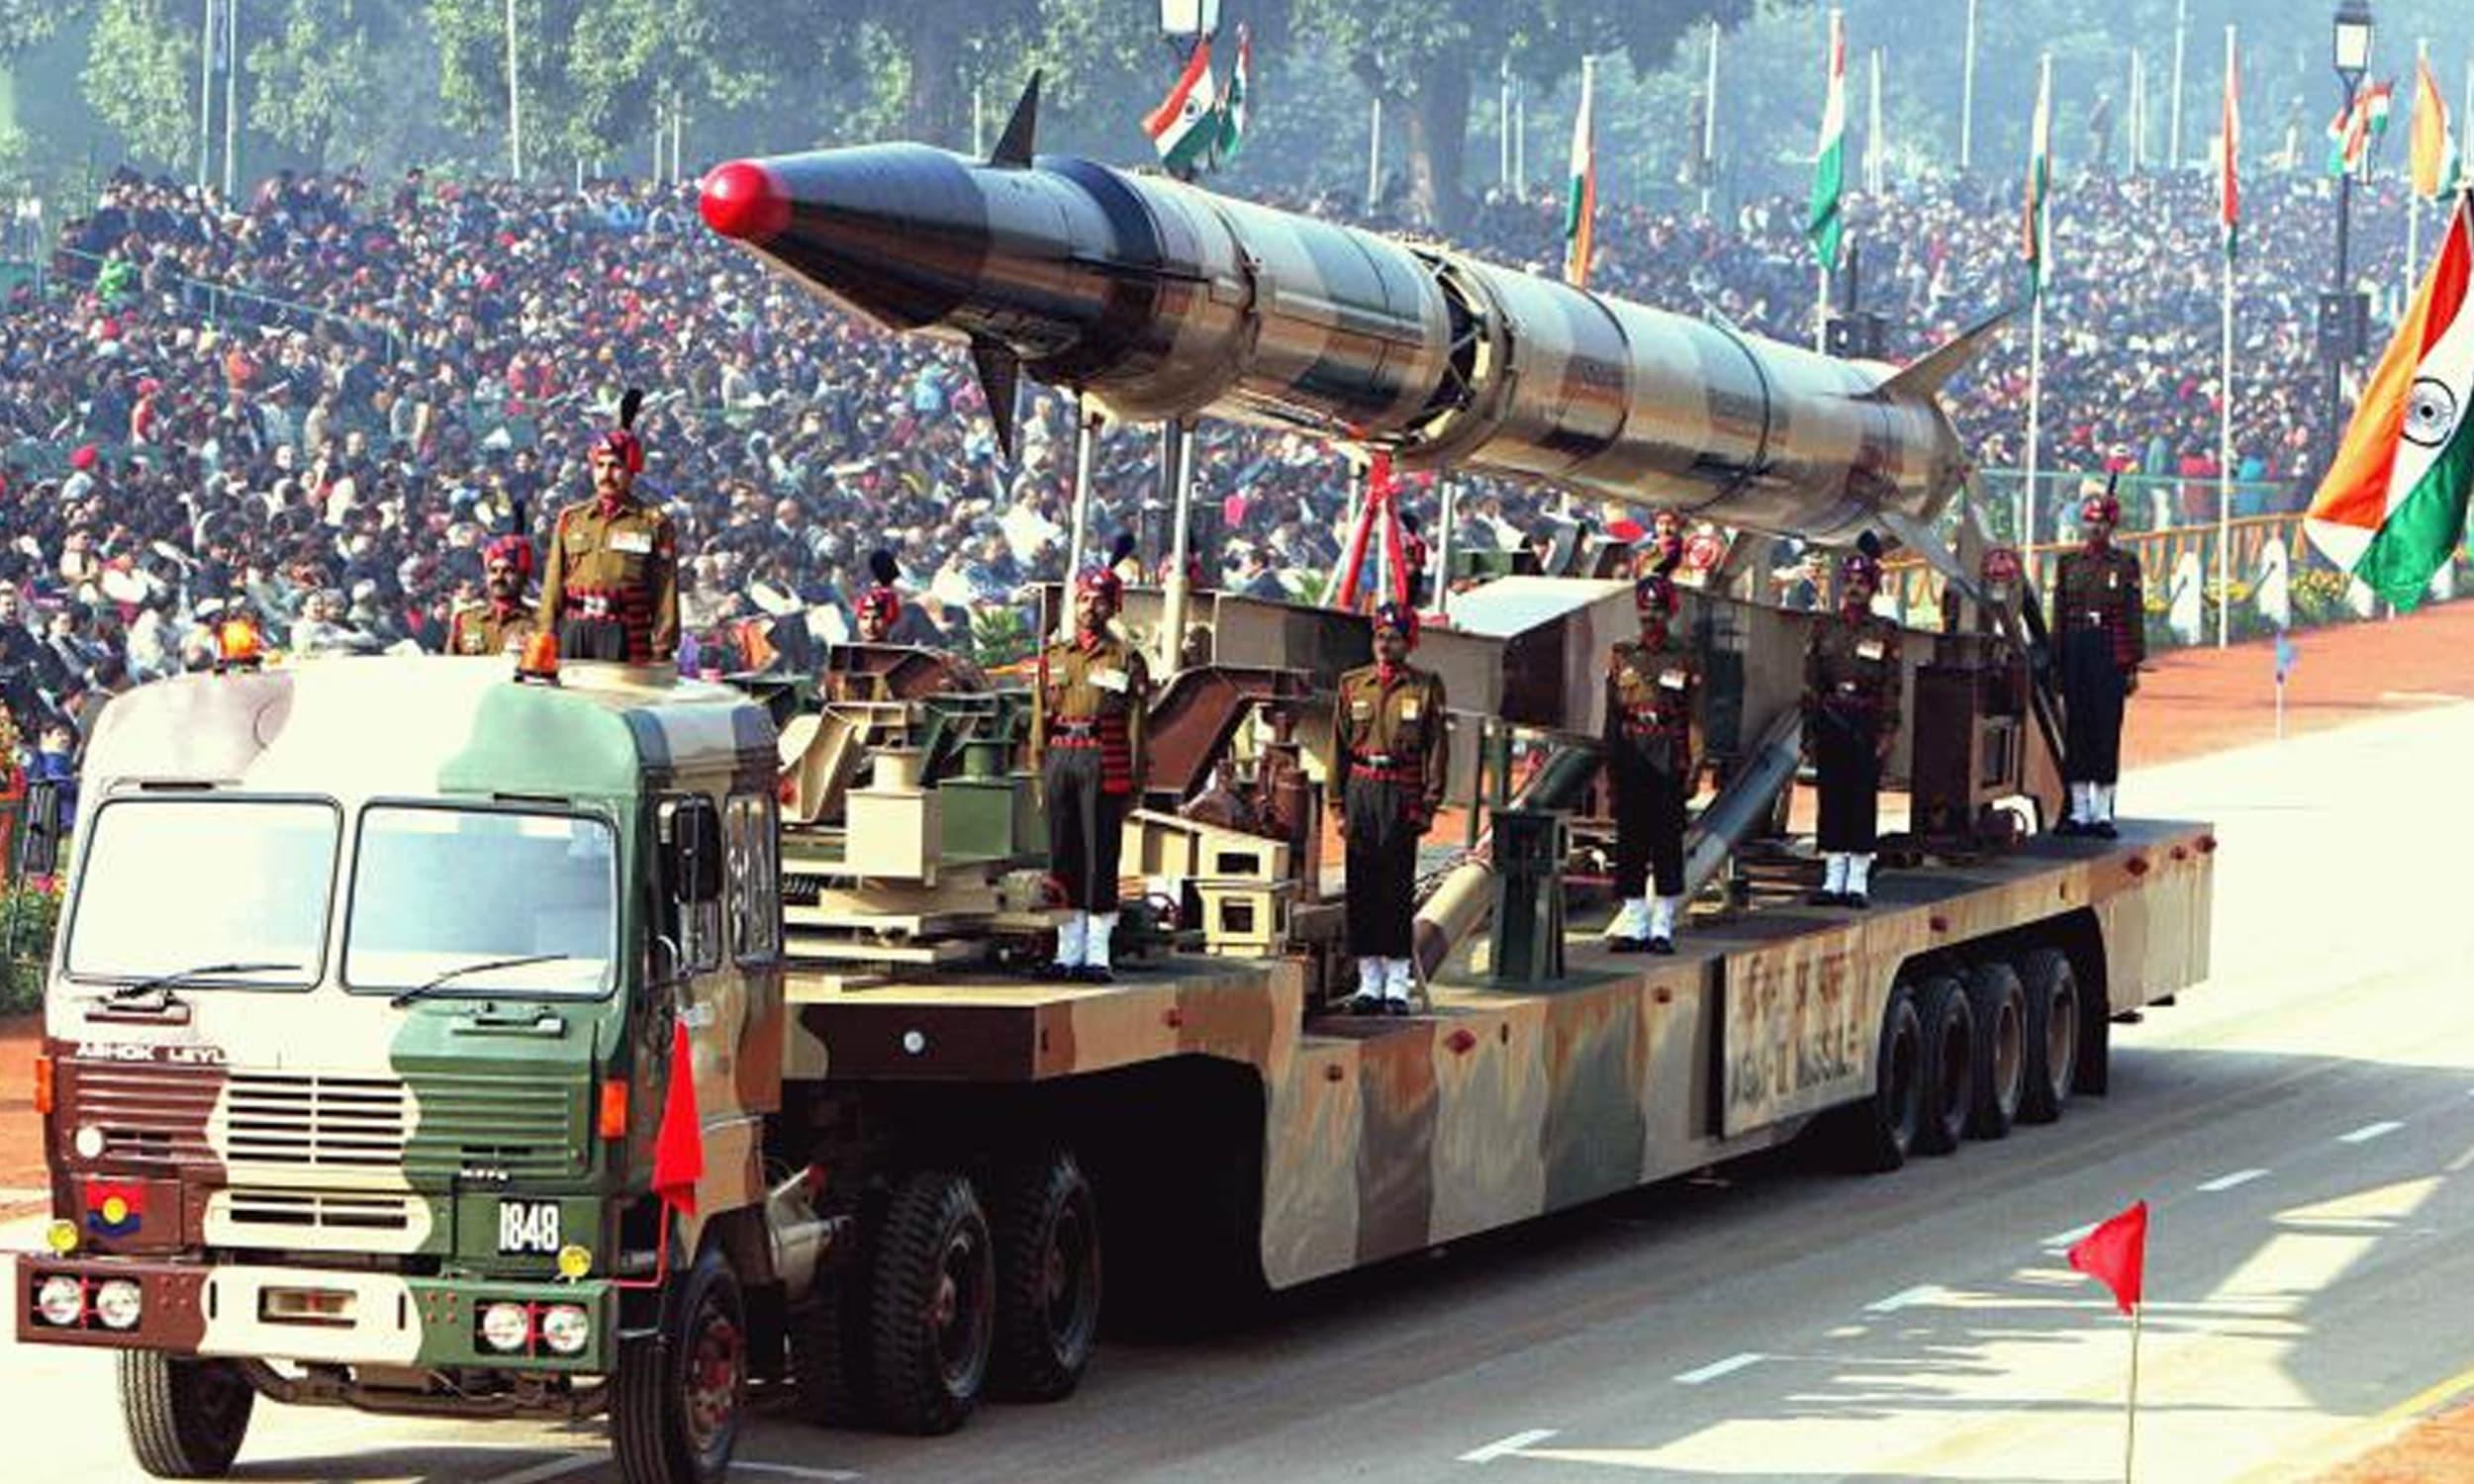 Pakistan wants India's entire nuclear programme under IAEA safeguards